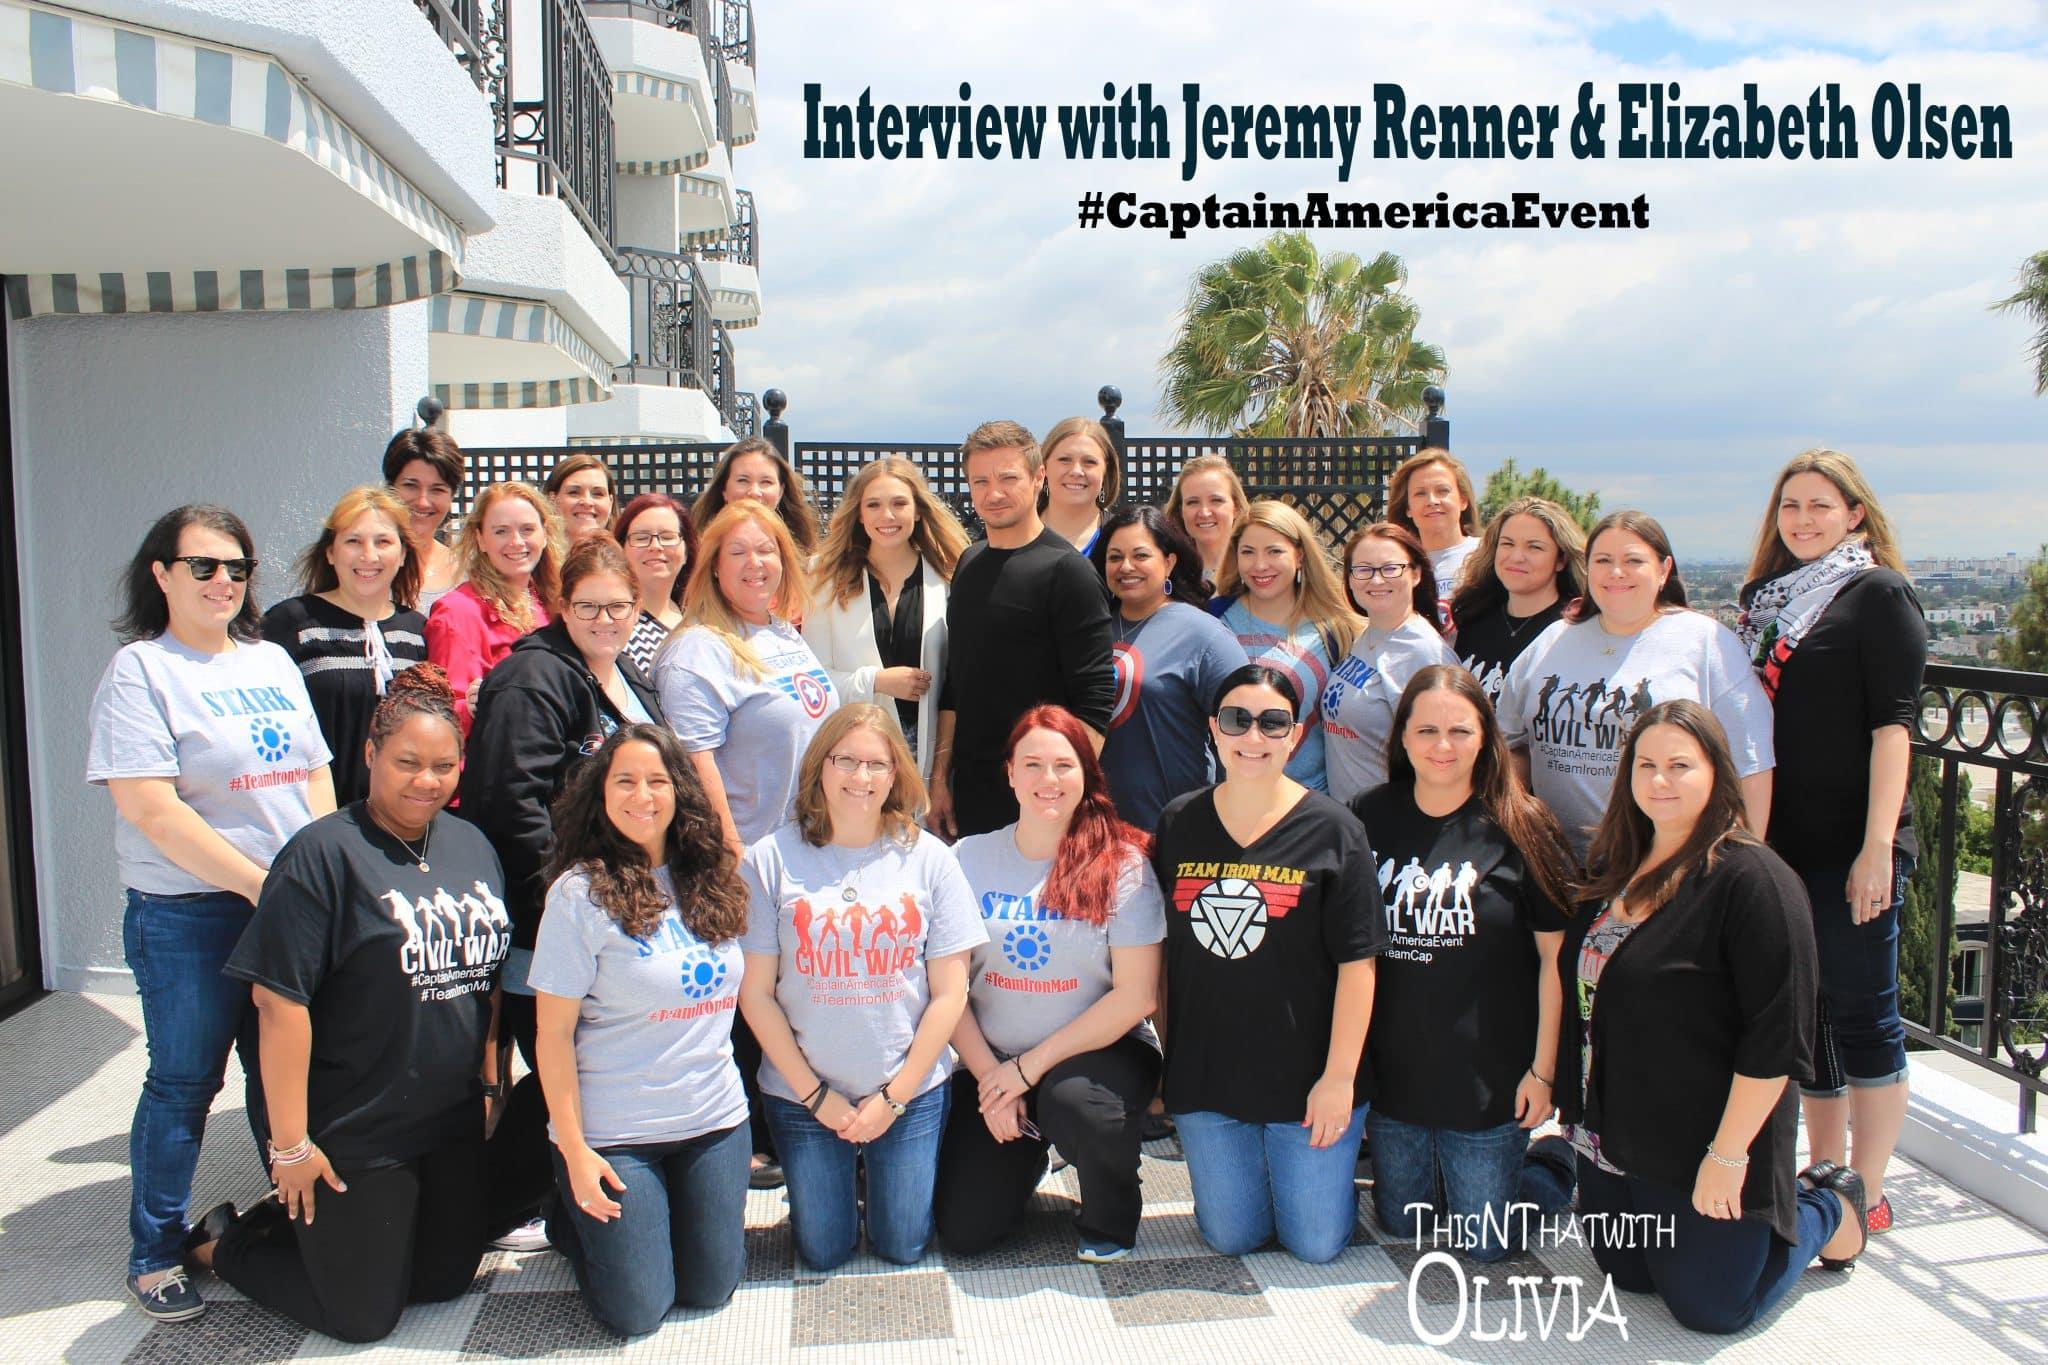 Interview with Jeremy Renner + Elizabeth Olsen #CaptainAmericaEvent